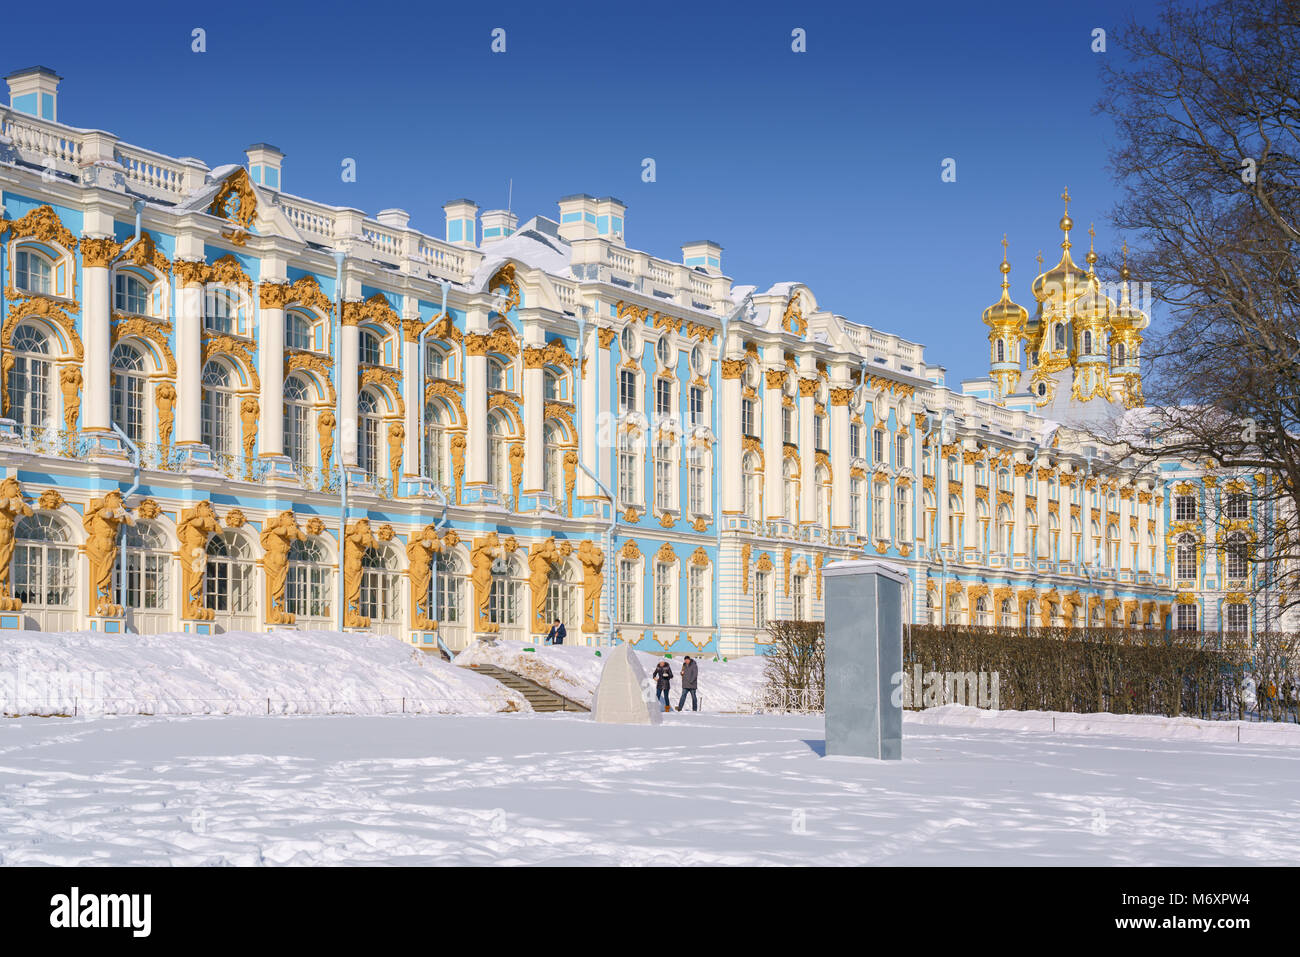 The Catherine Palace, Tsarskoye Selo, Pushkin, Saint-Petersburg, Russia - Stock Image